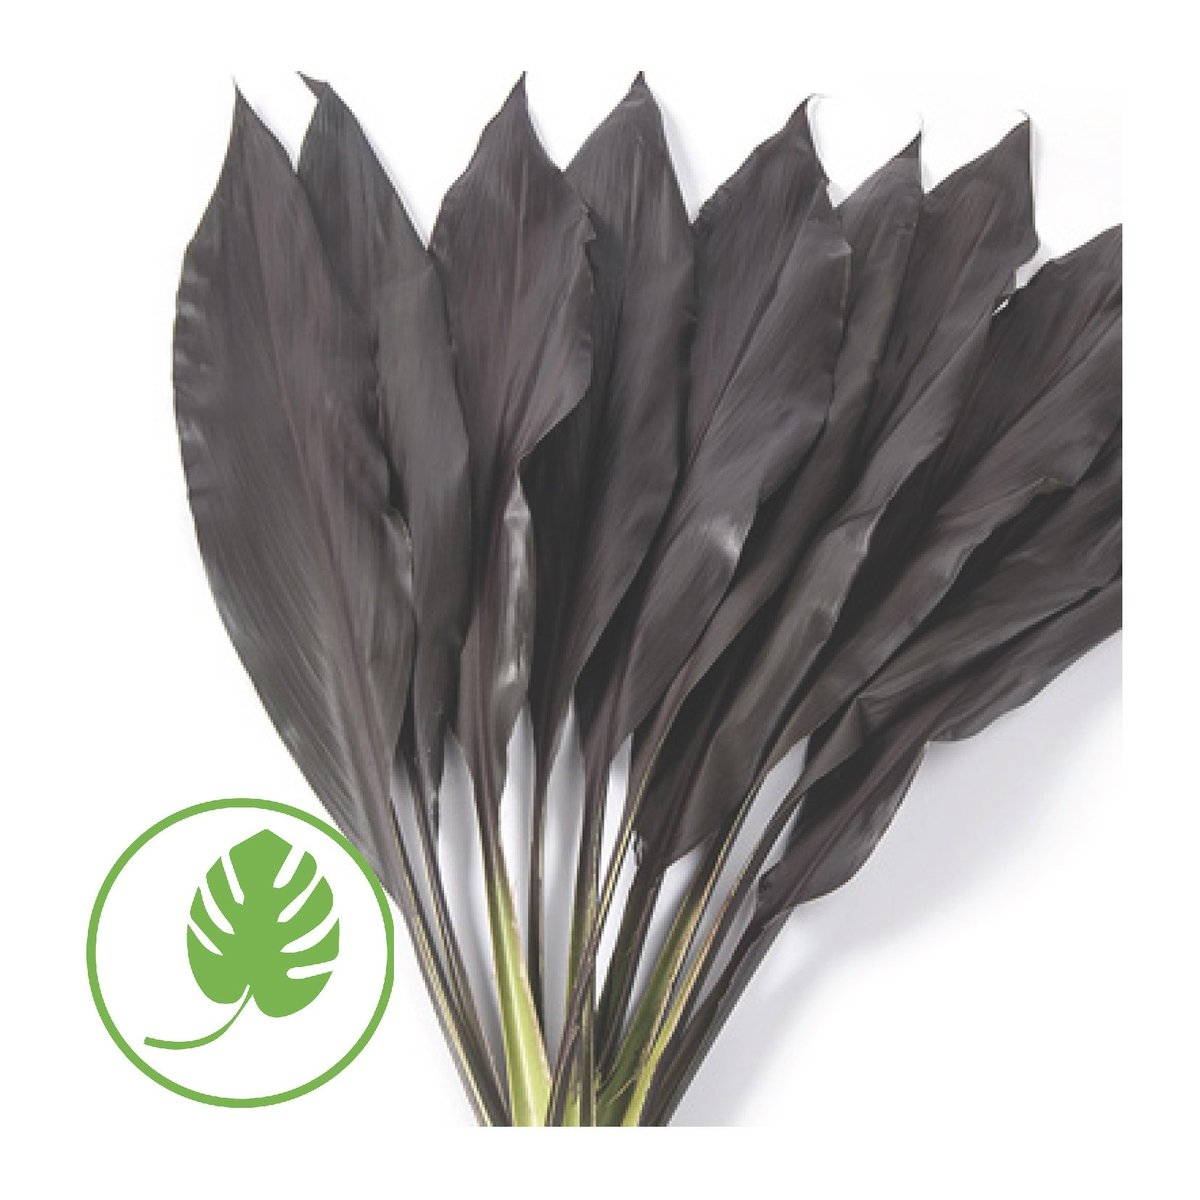 10 Cordyline blad Black Tie